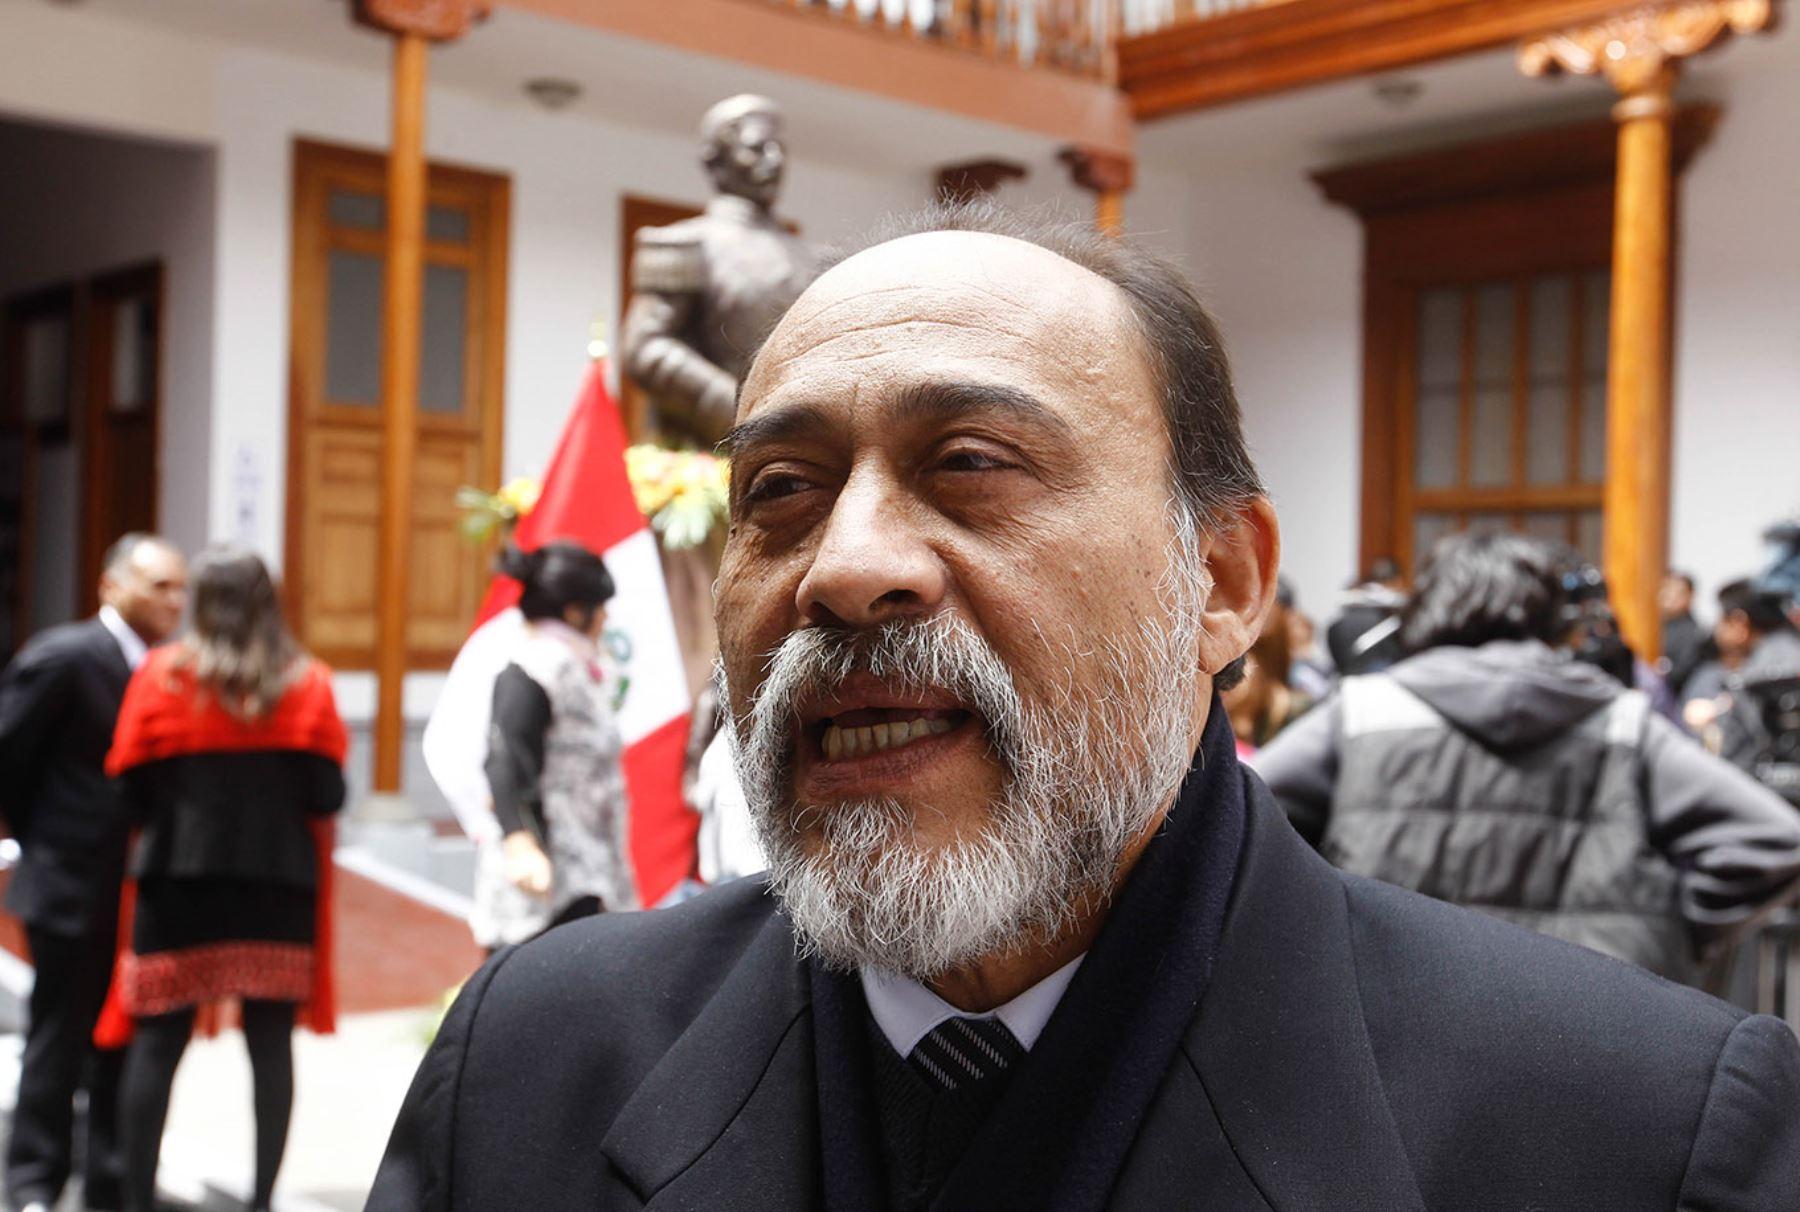 Jefe de la Reniec, Jorge Yrivarren. ANDINA/Juan Carlos Guzmán